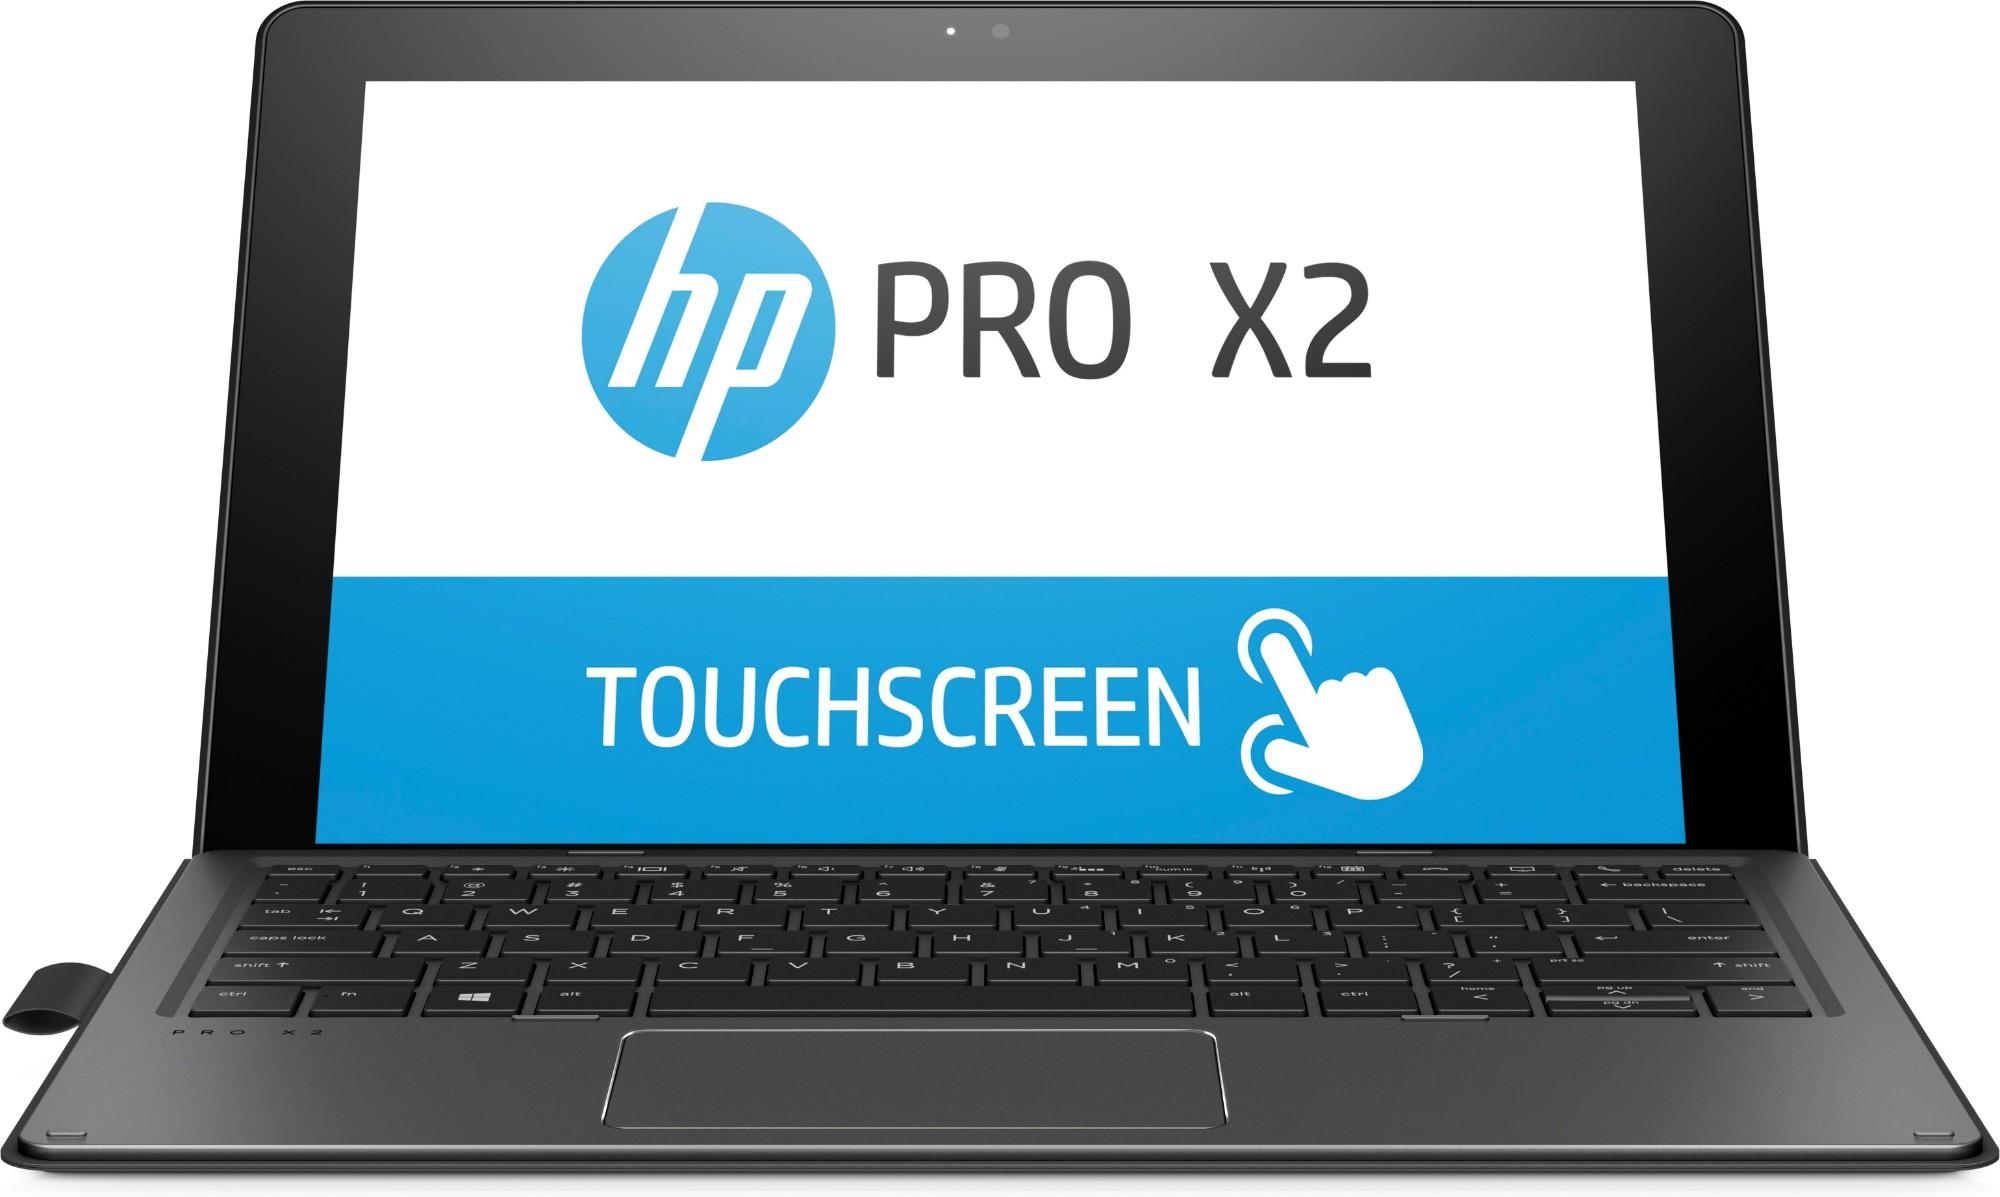 HP Pro x2 612 G2 Tablet